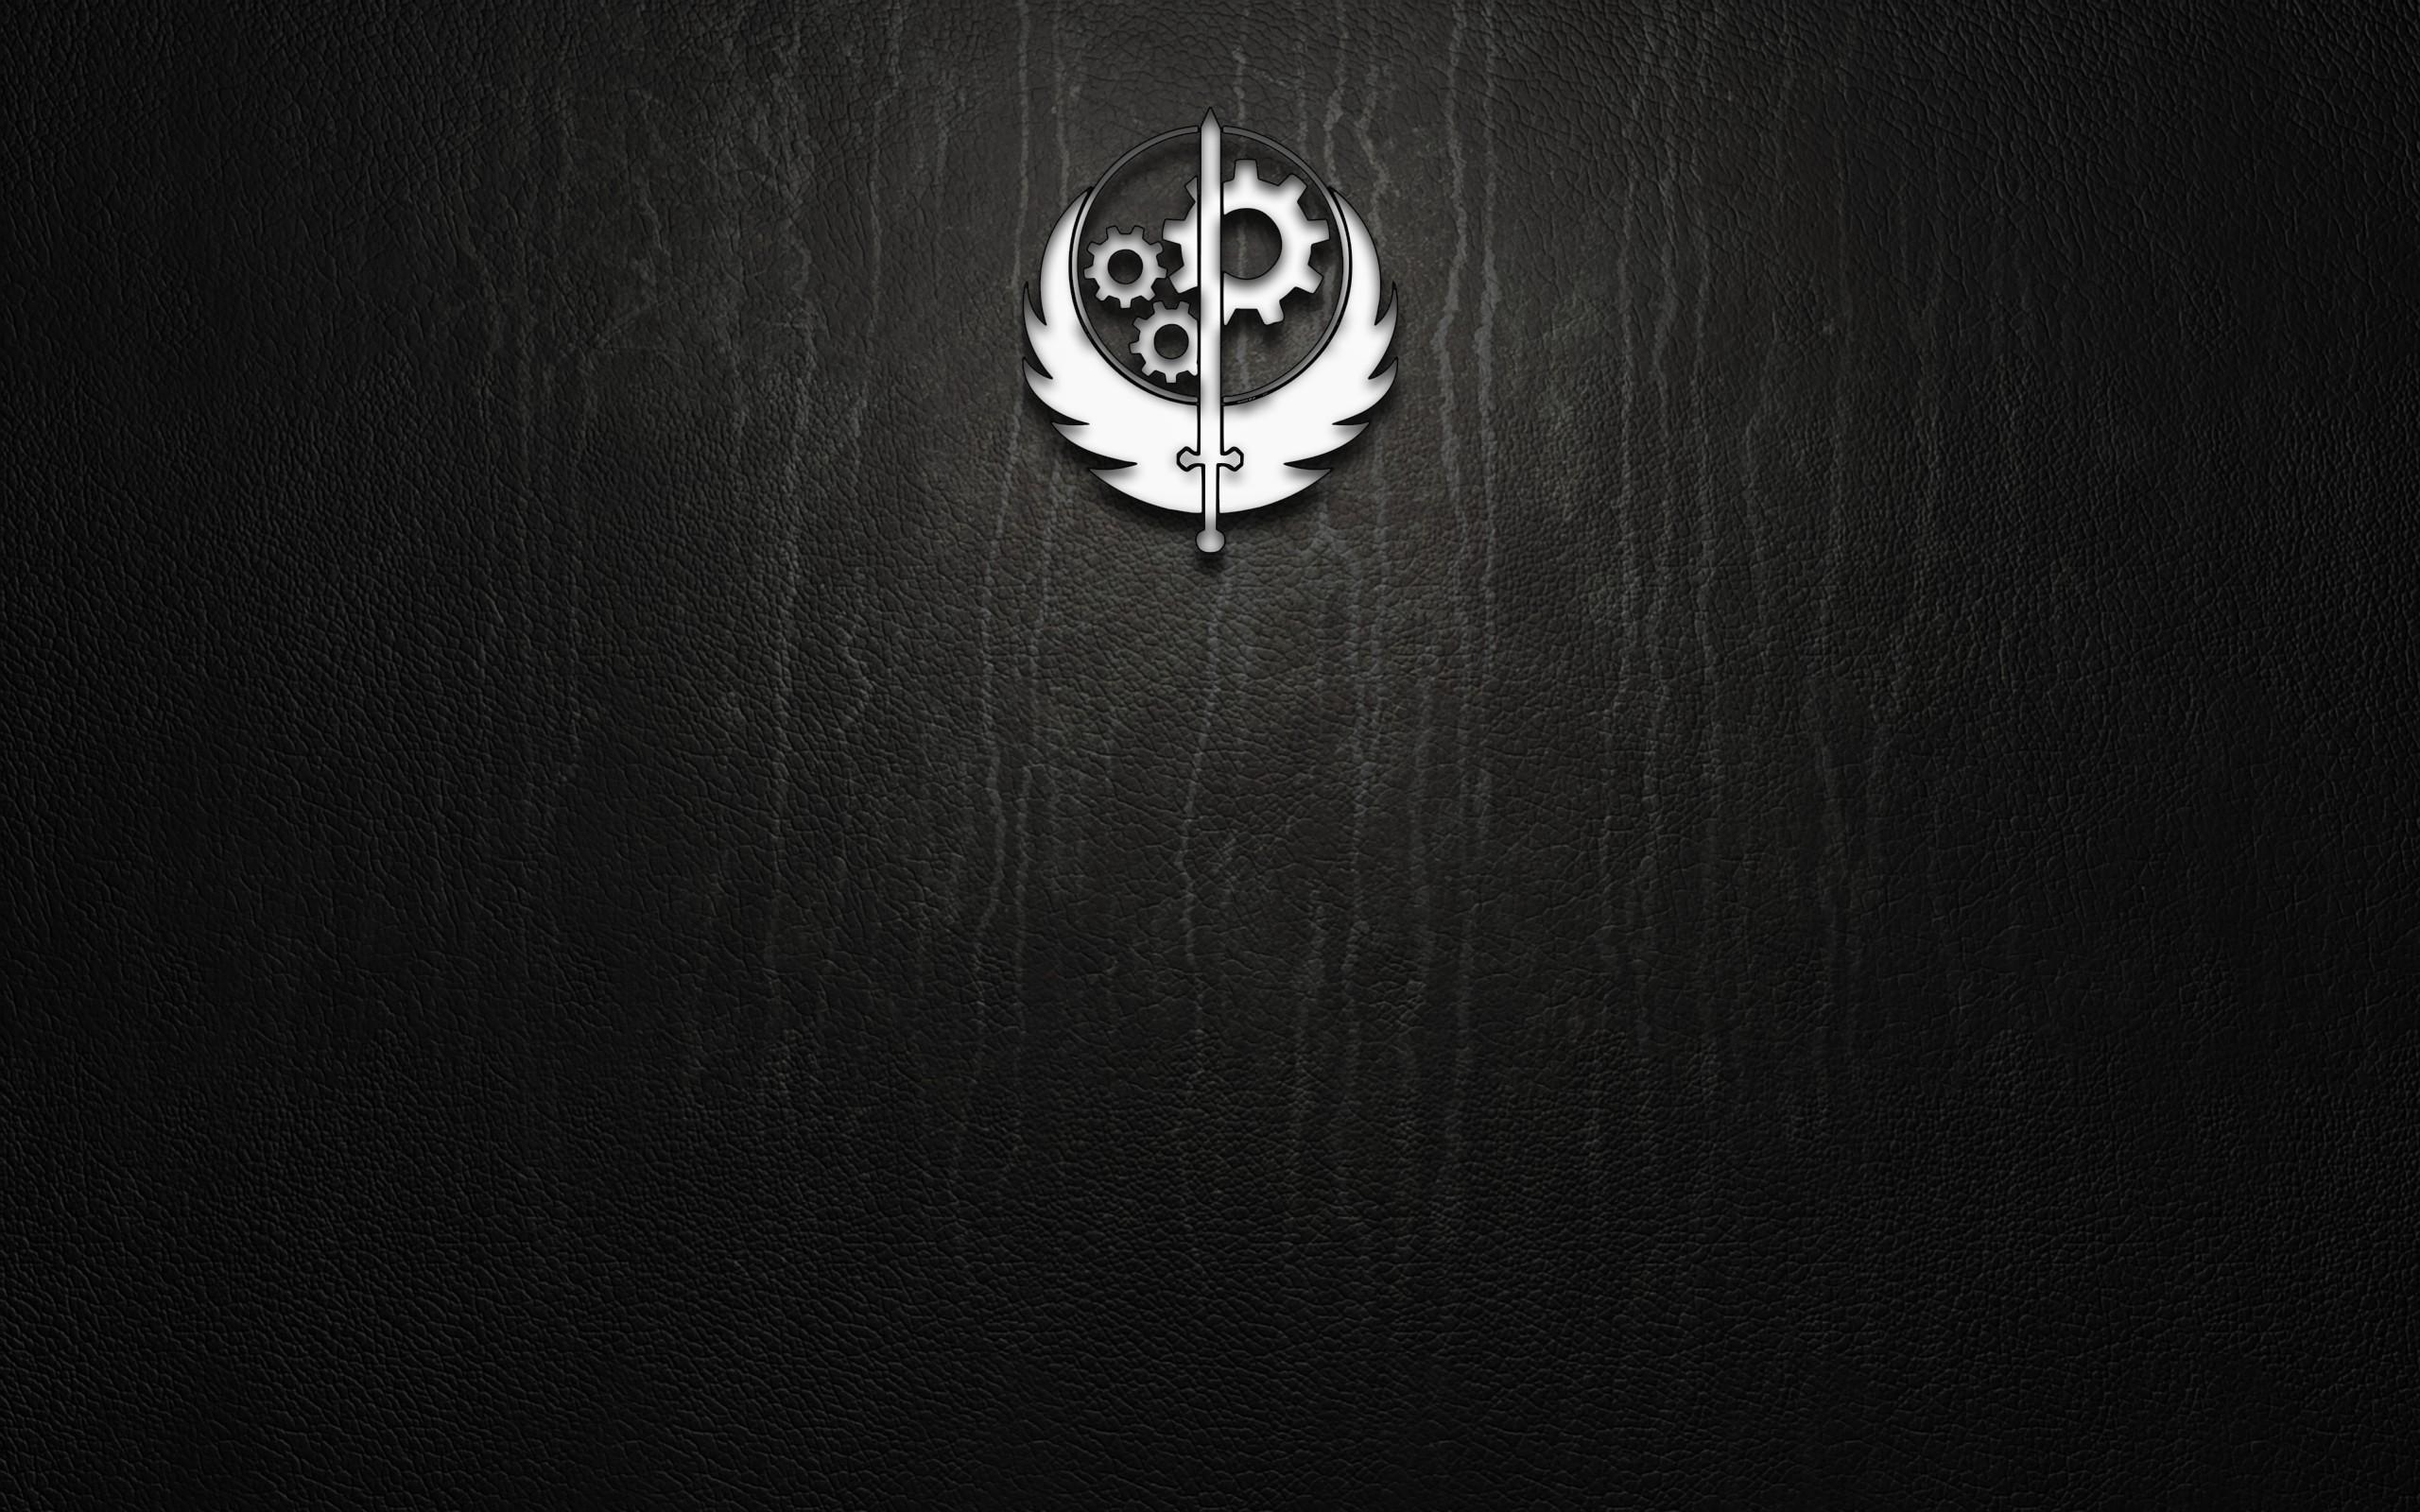 Brotherhood Of Steel Wallpaper Download Free Beautiful Full Hd